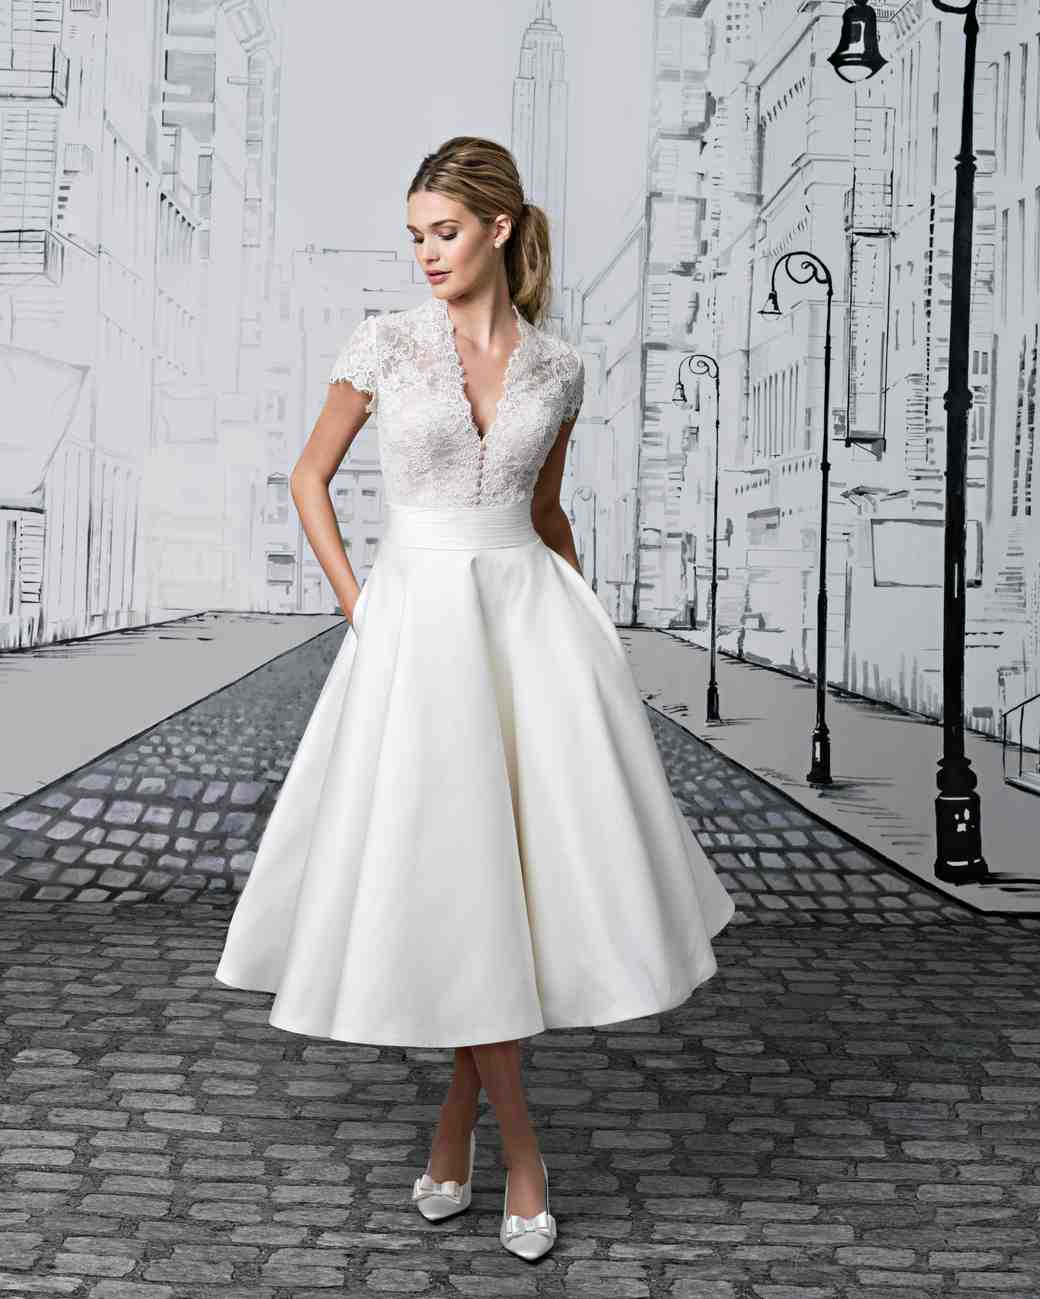 Princess Grace Wedding Dress Style | Dress images